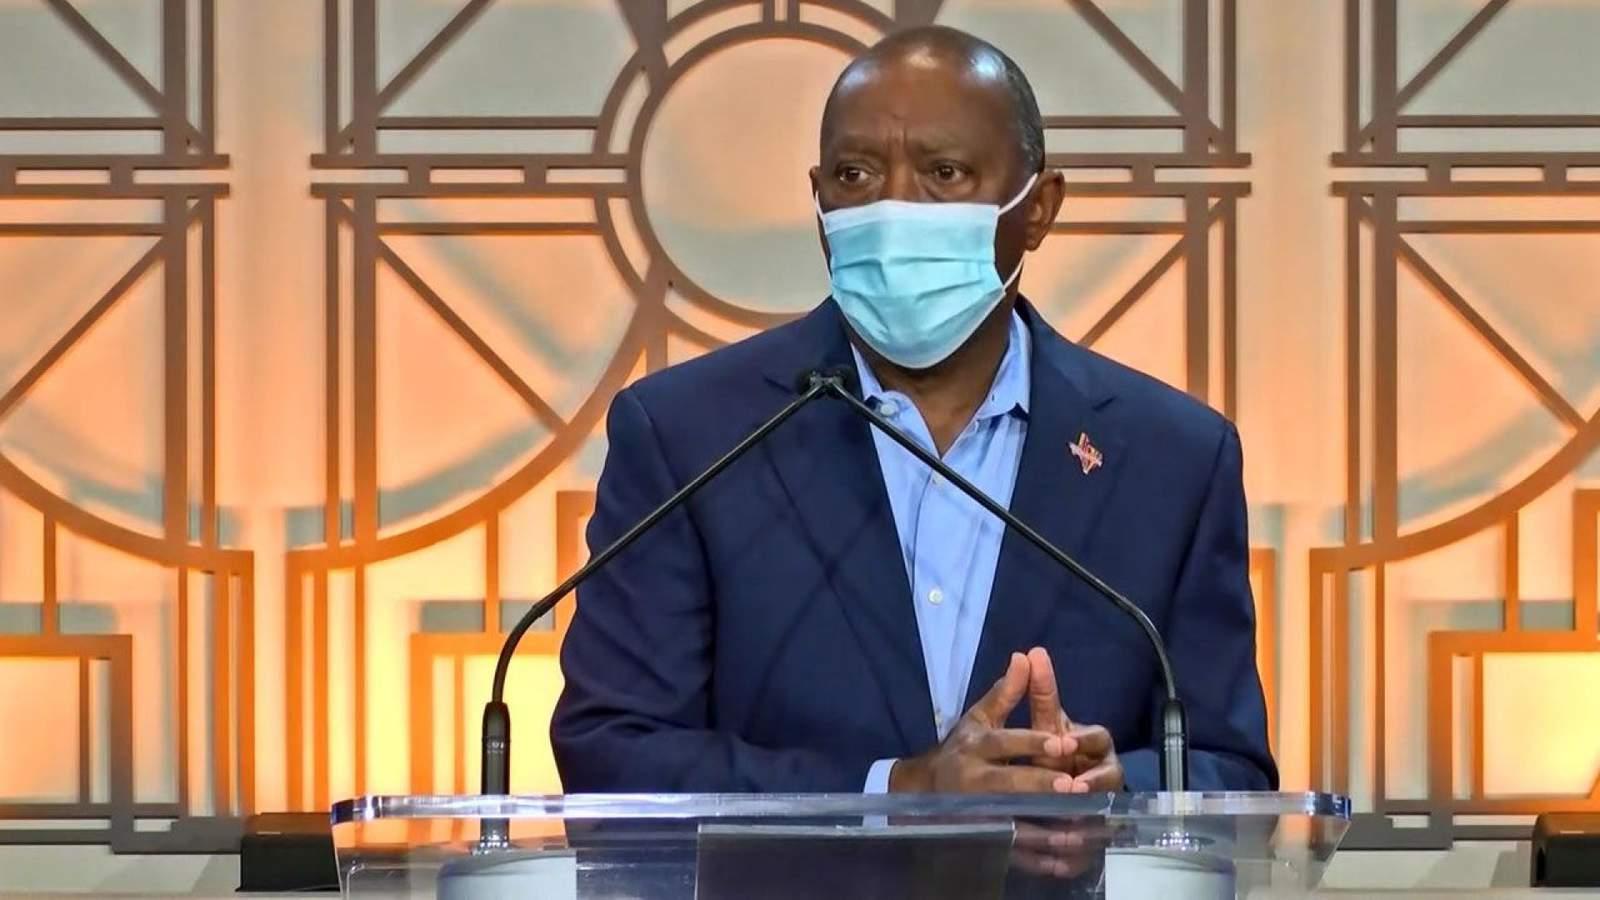 Turner considers curfew as Houston's coronavirus cases increase